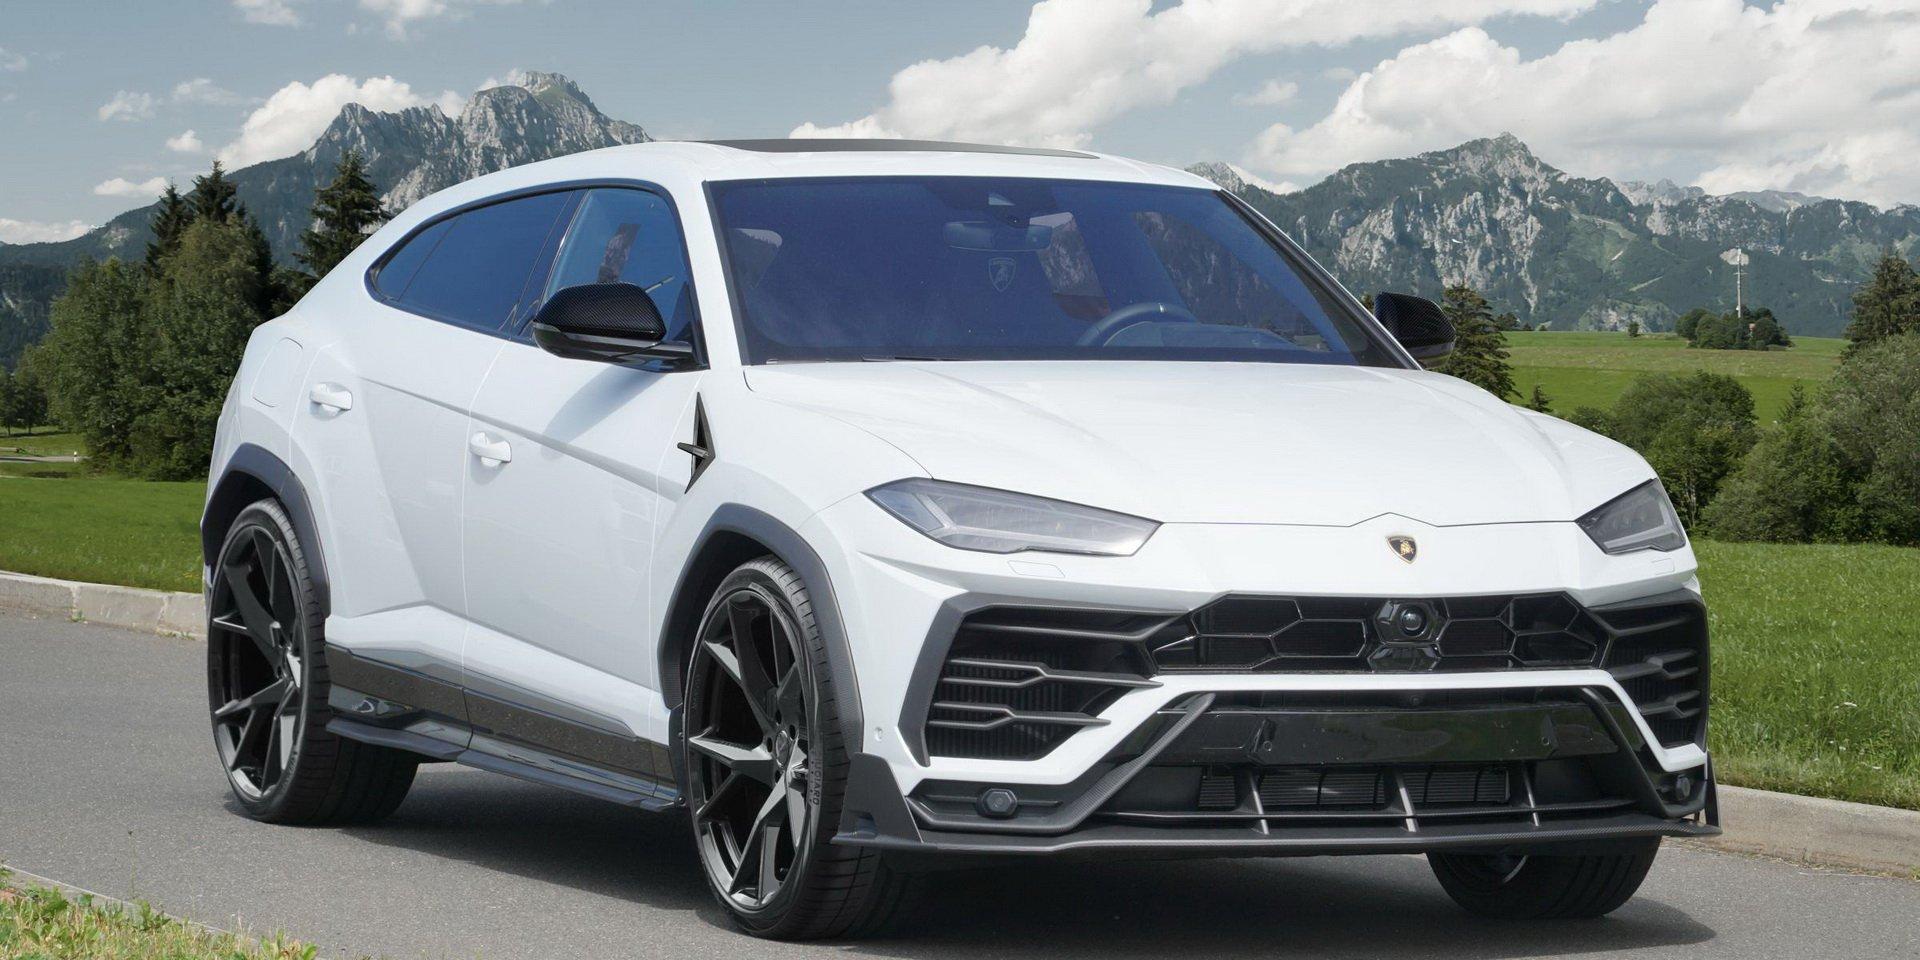 Lamborghini-Urus-by-Urus-1